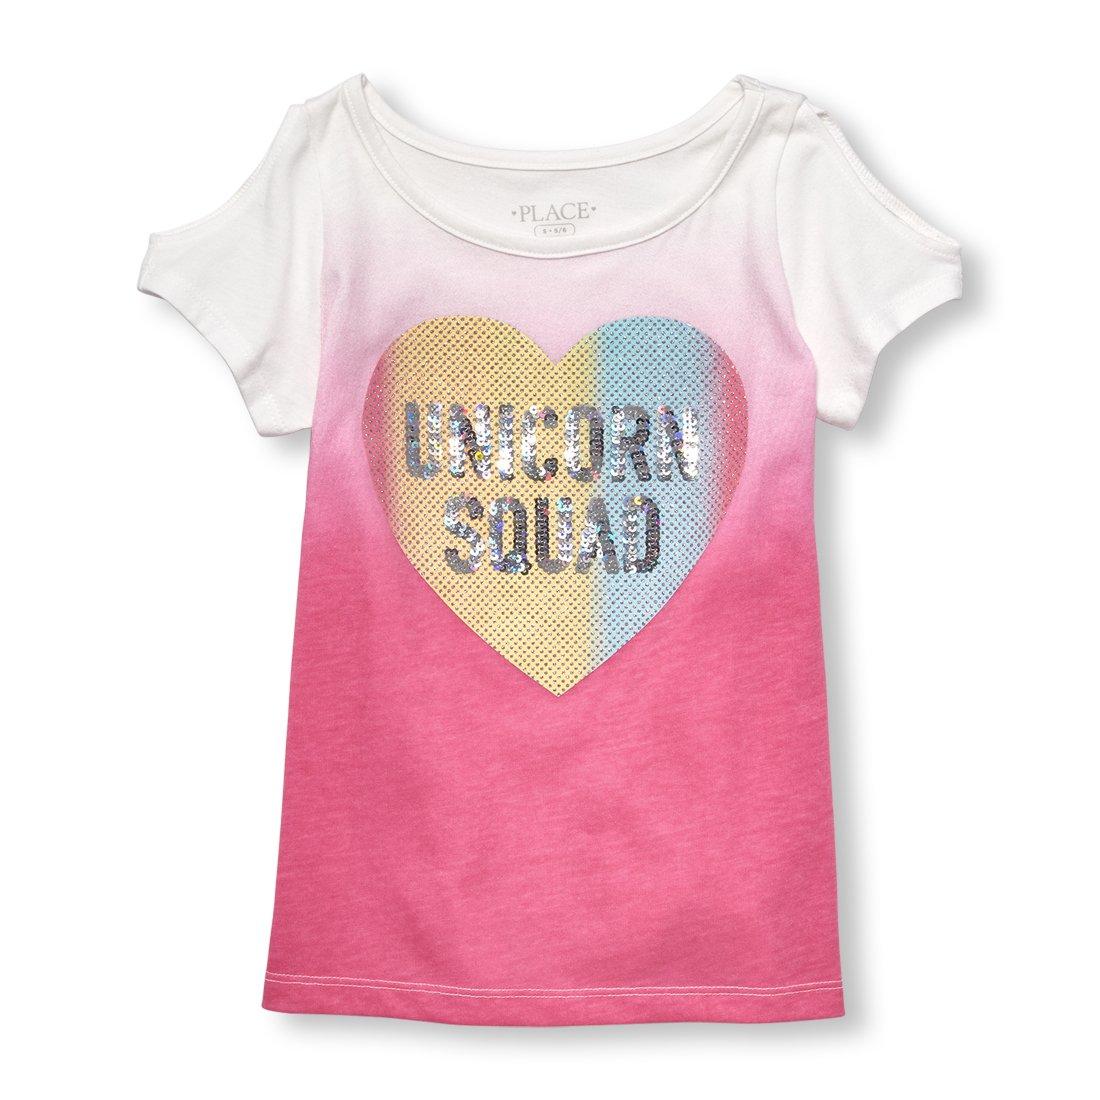 The Children's Place Big Girls' Short Sleeve Top, Jazzberry 02369, L (10/12)